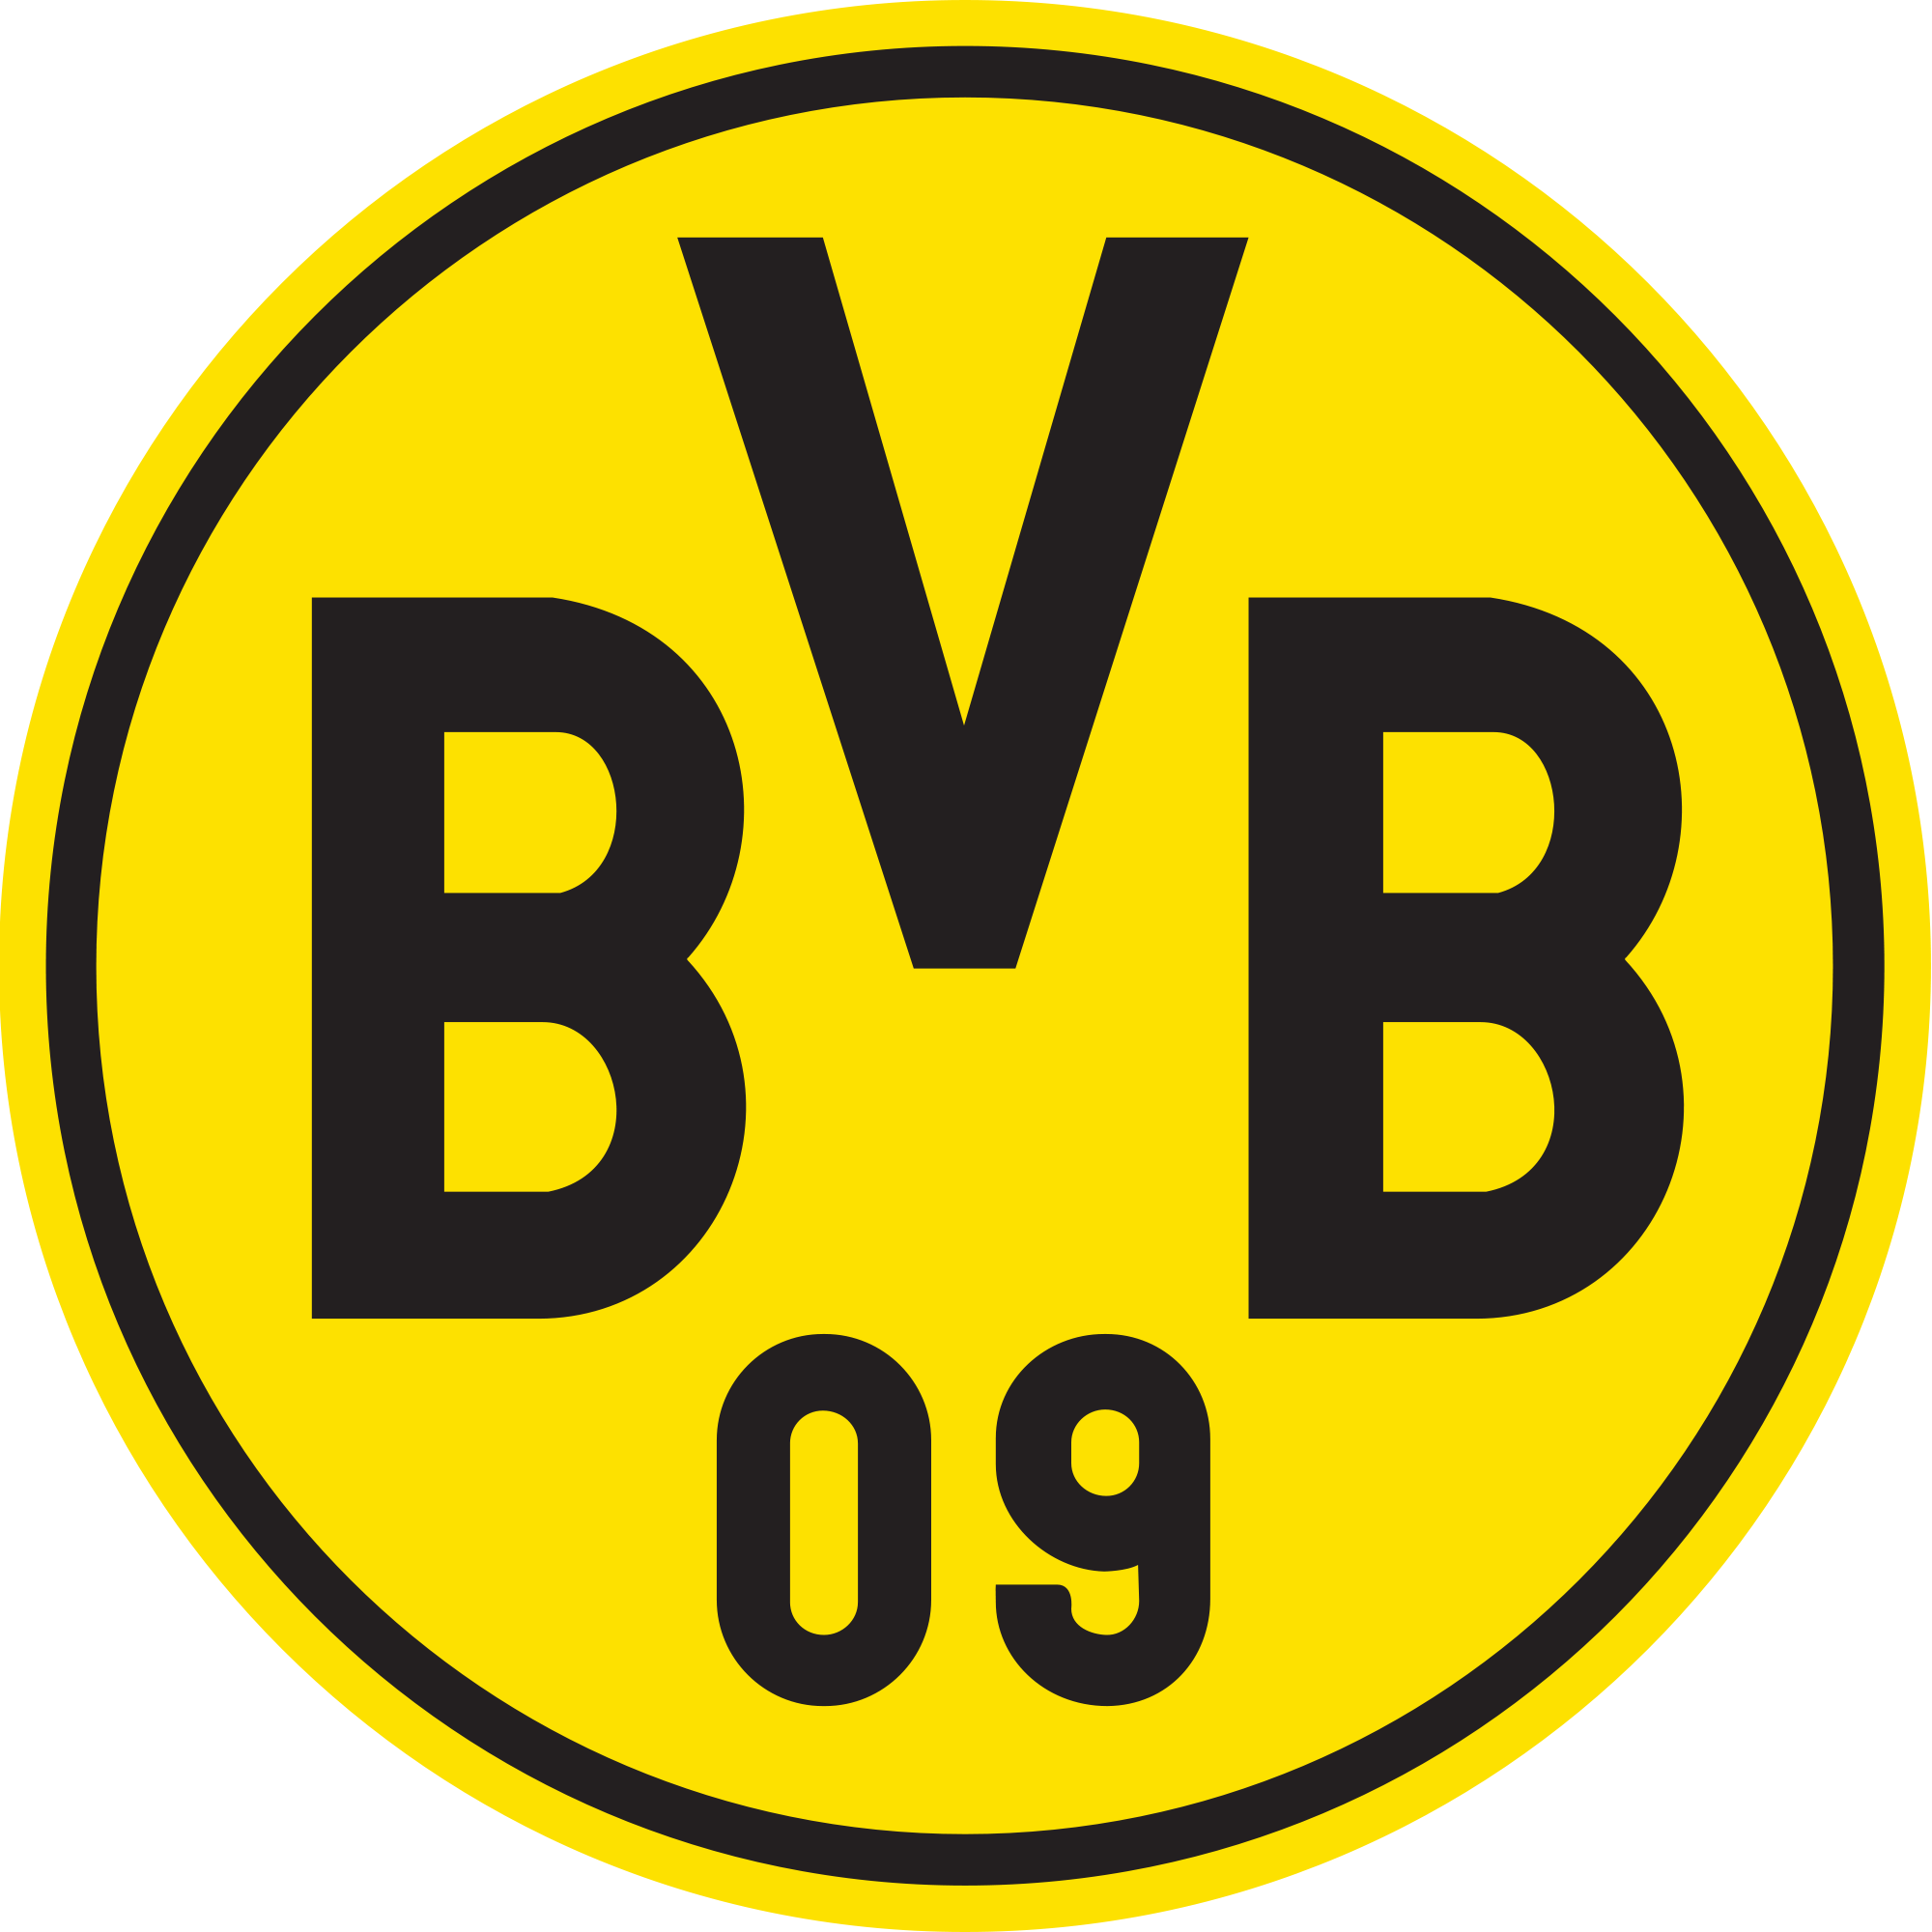 borussia_dortmund_logo.png